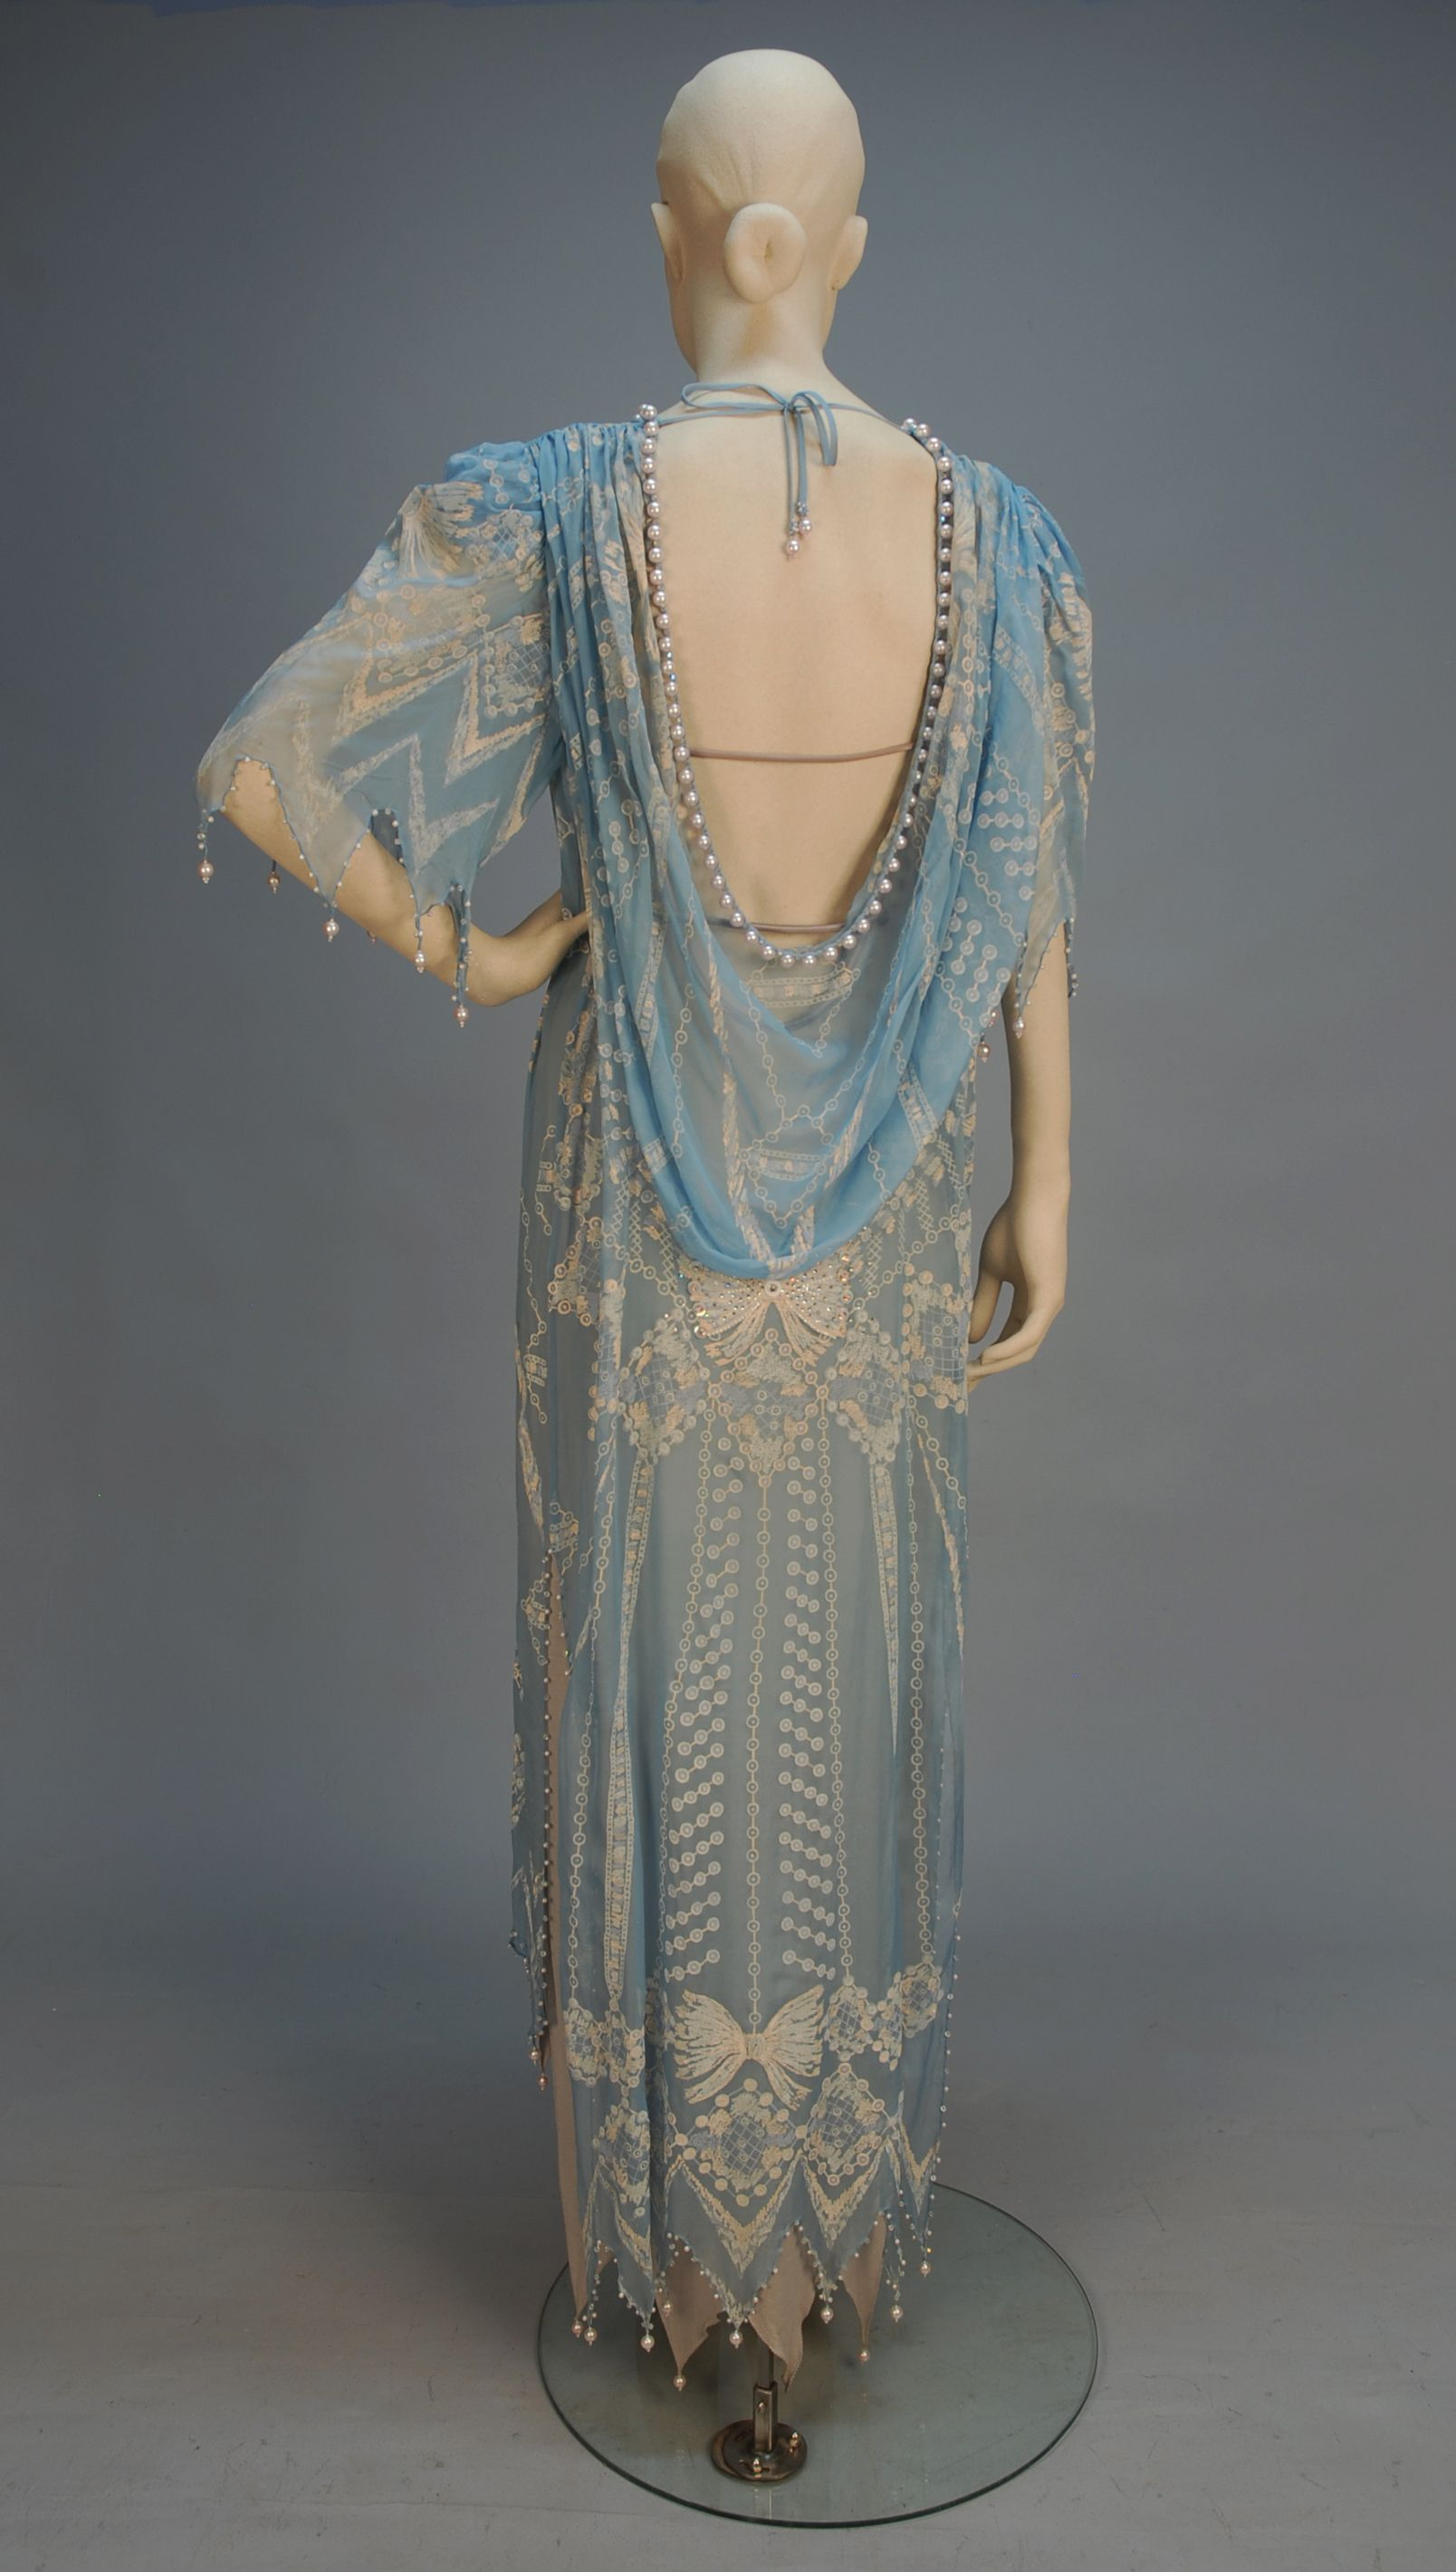 LOT 912 - whitakerauction | 1920s Style | Pinterest | 1920s, Vintage ...